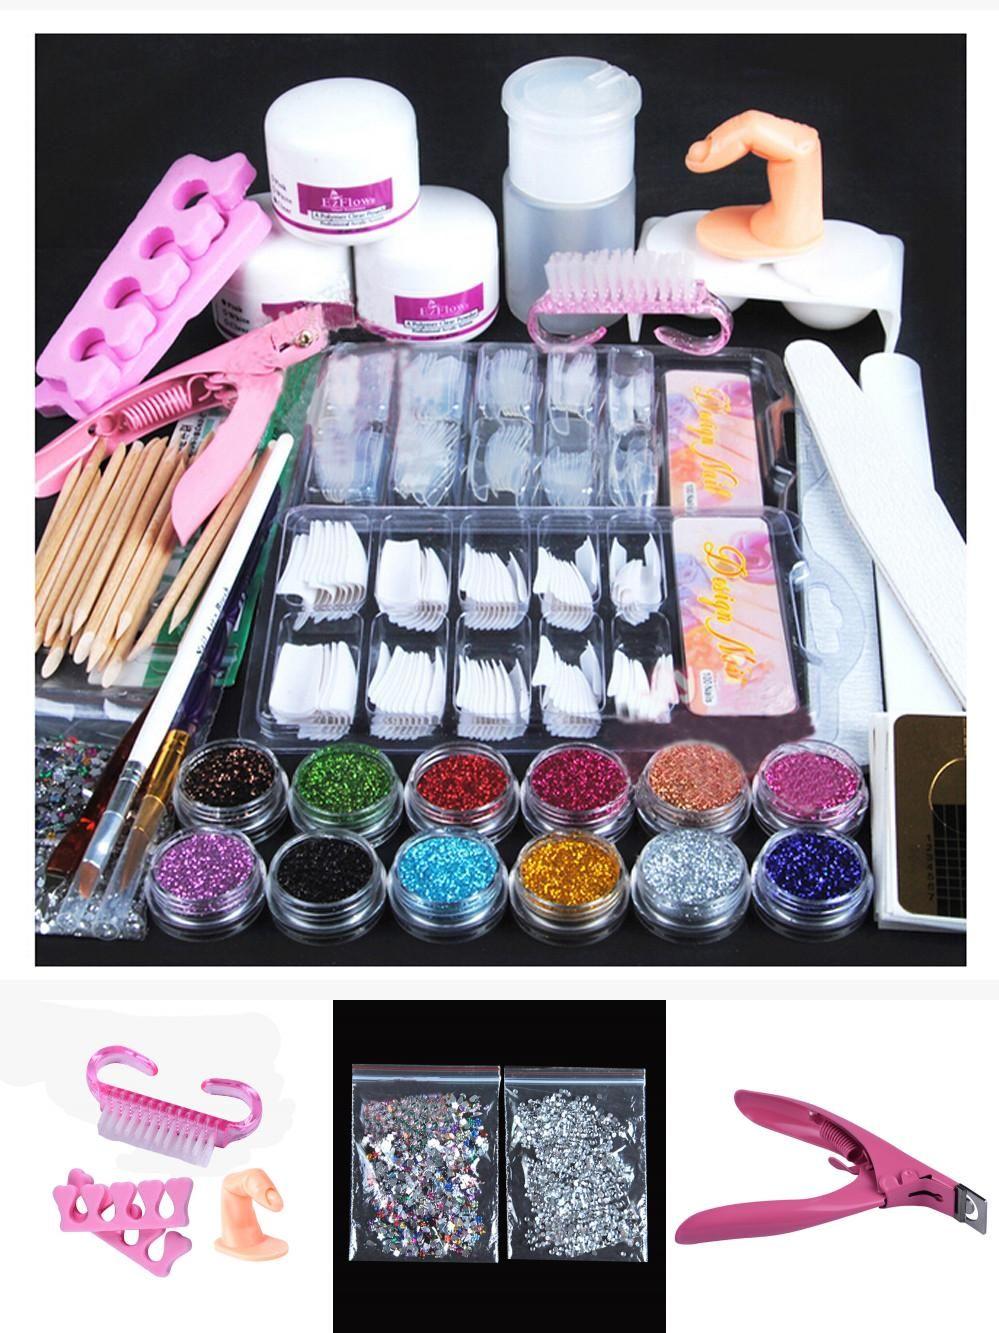 [Visit to Buy] 24 pcs/Set Nail Art Tools Kit Sets Women